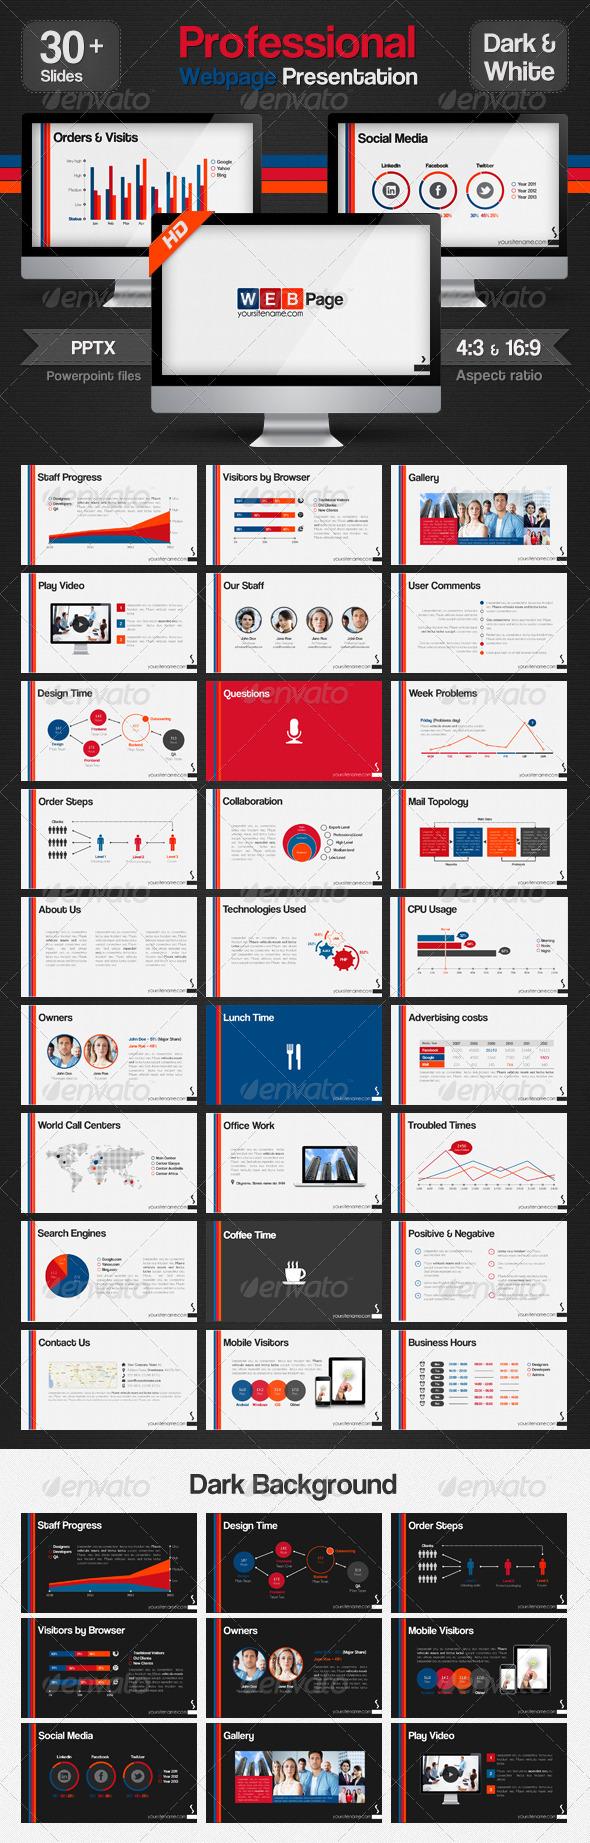 GraphicRiver Professional Web Page Presentation 4193815